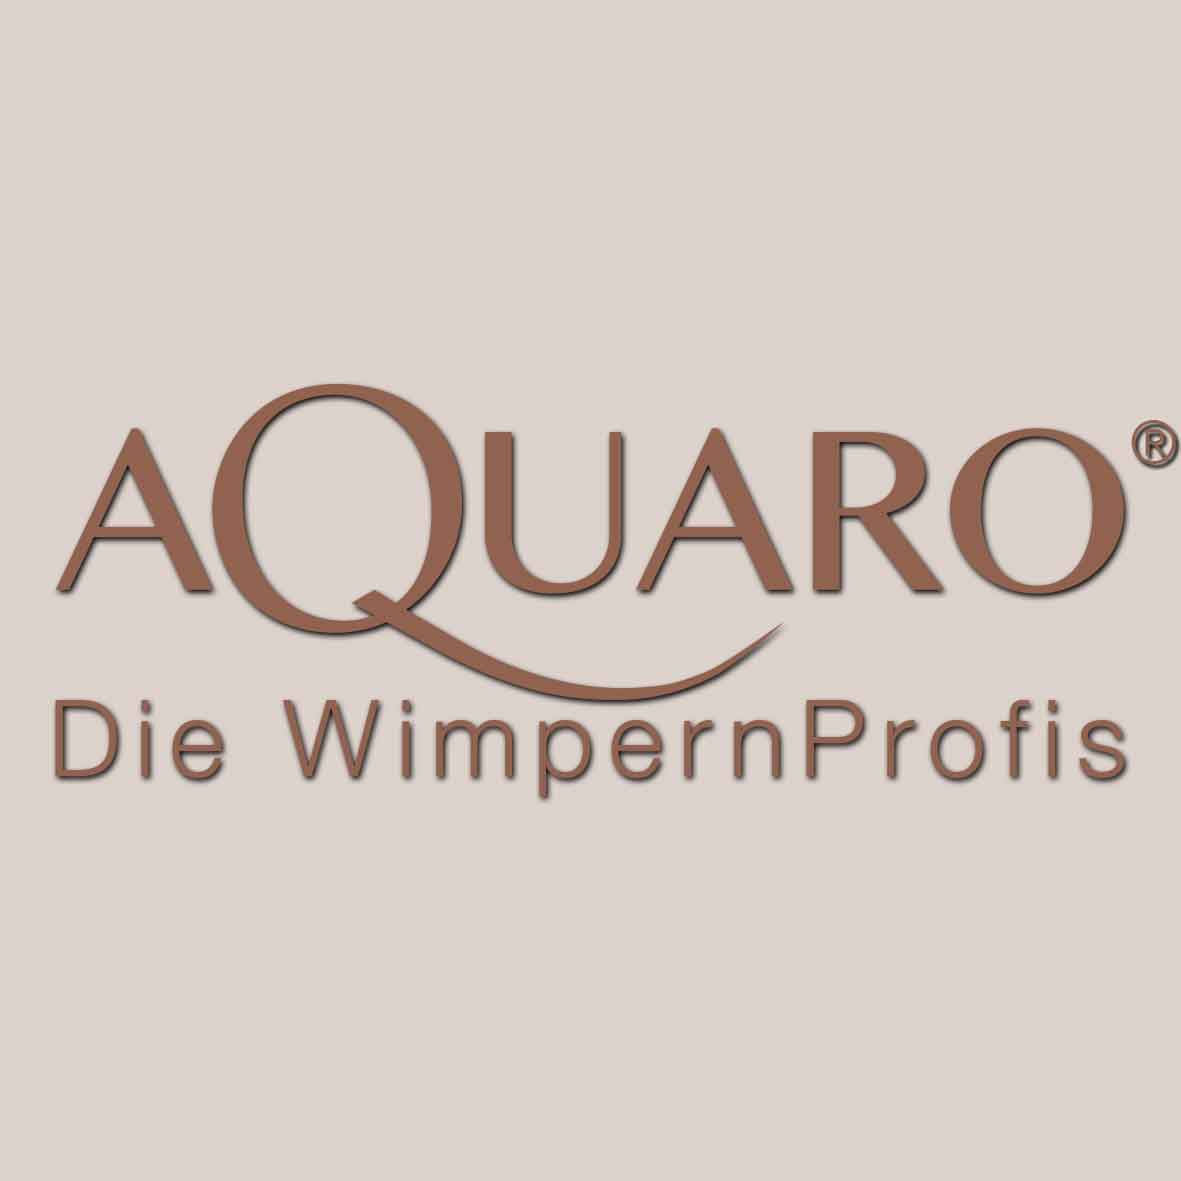 wimpernprofis6a_aquarodesign